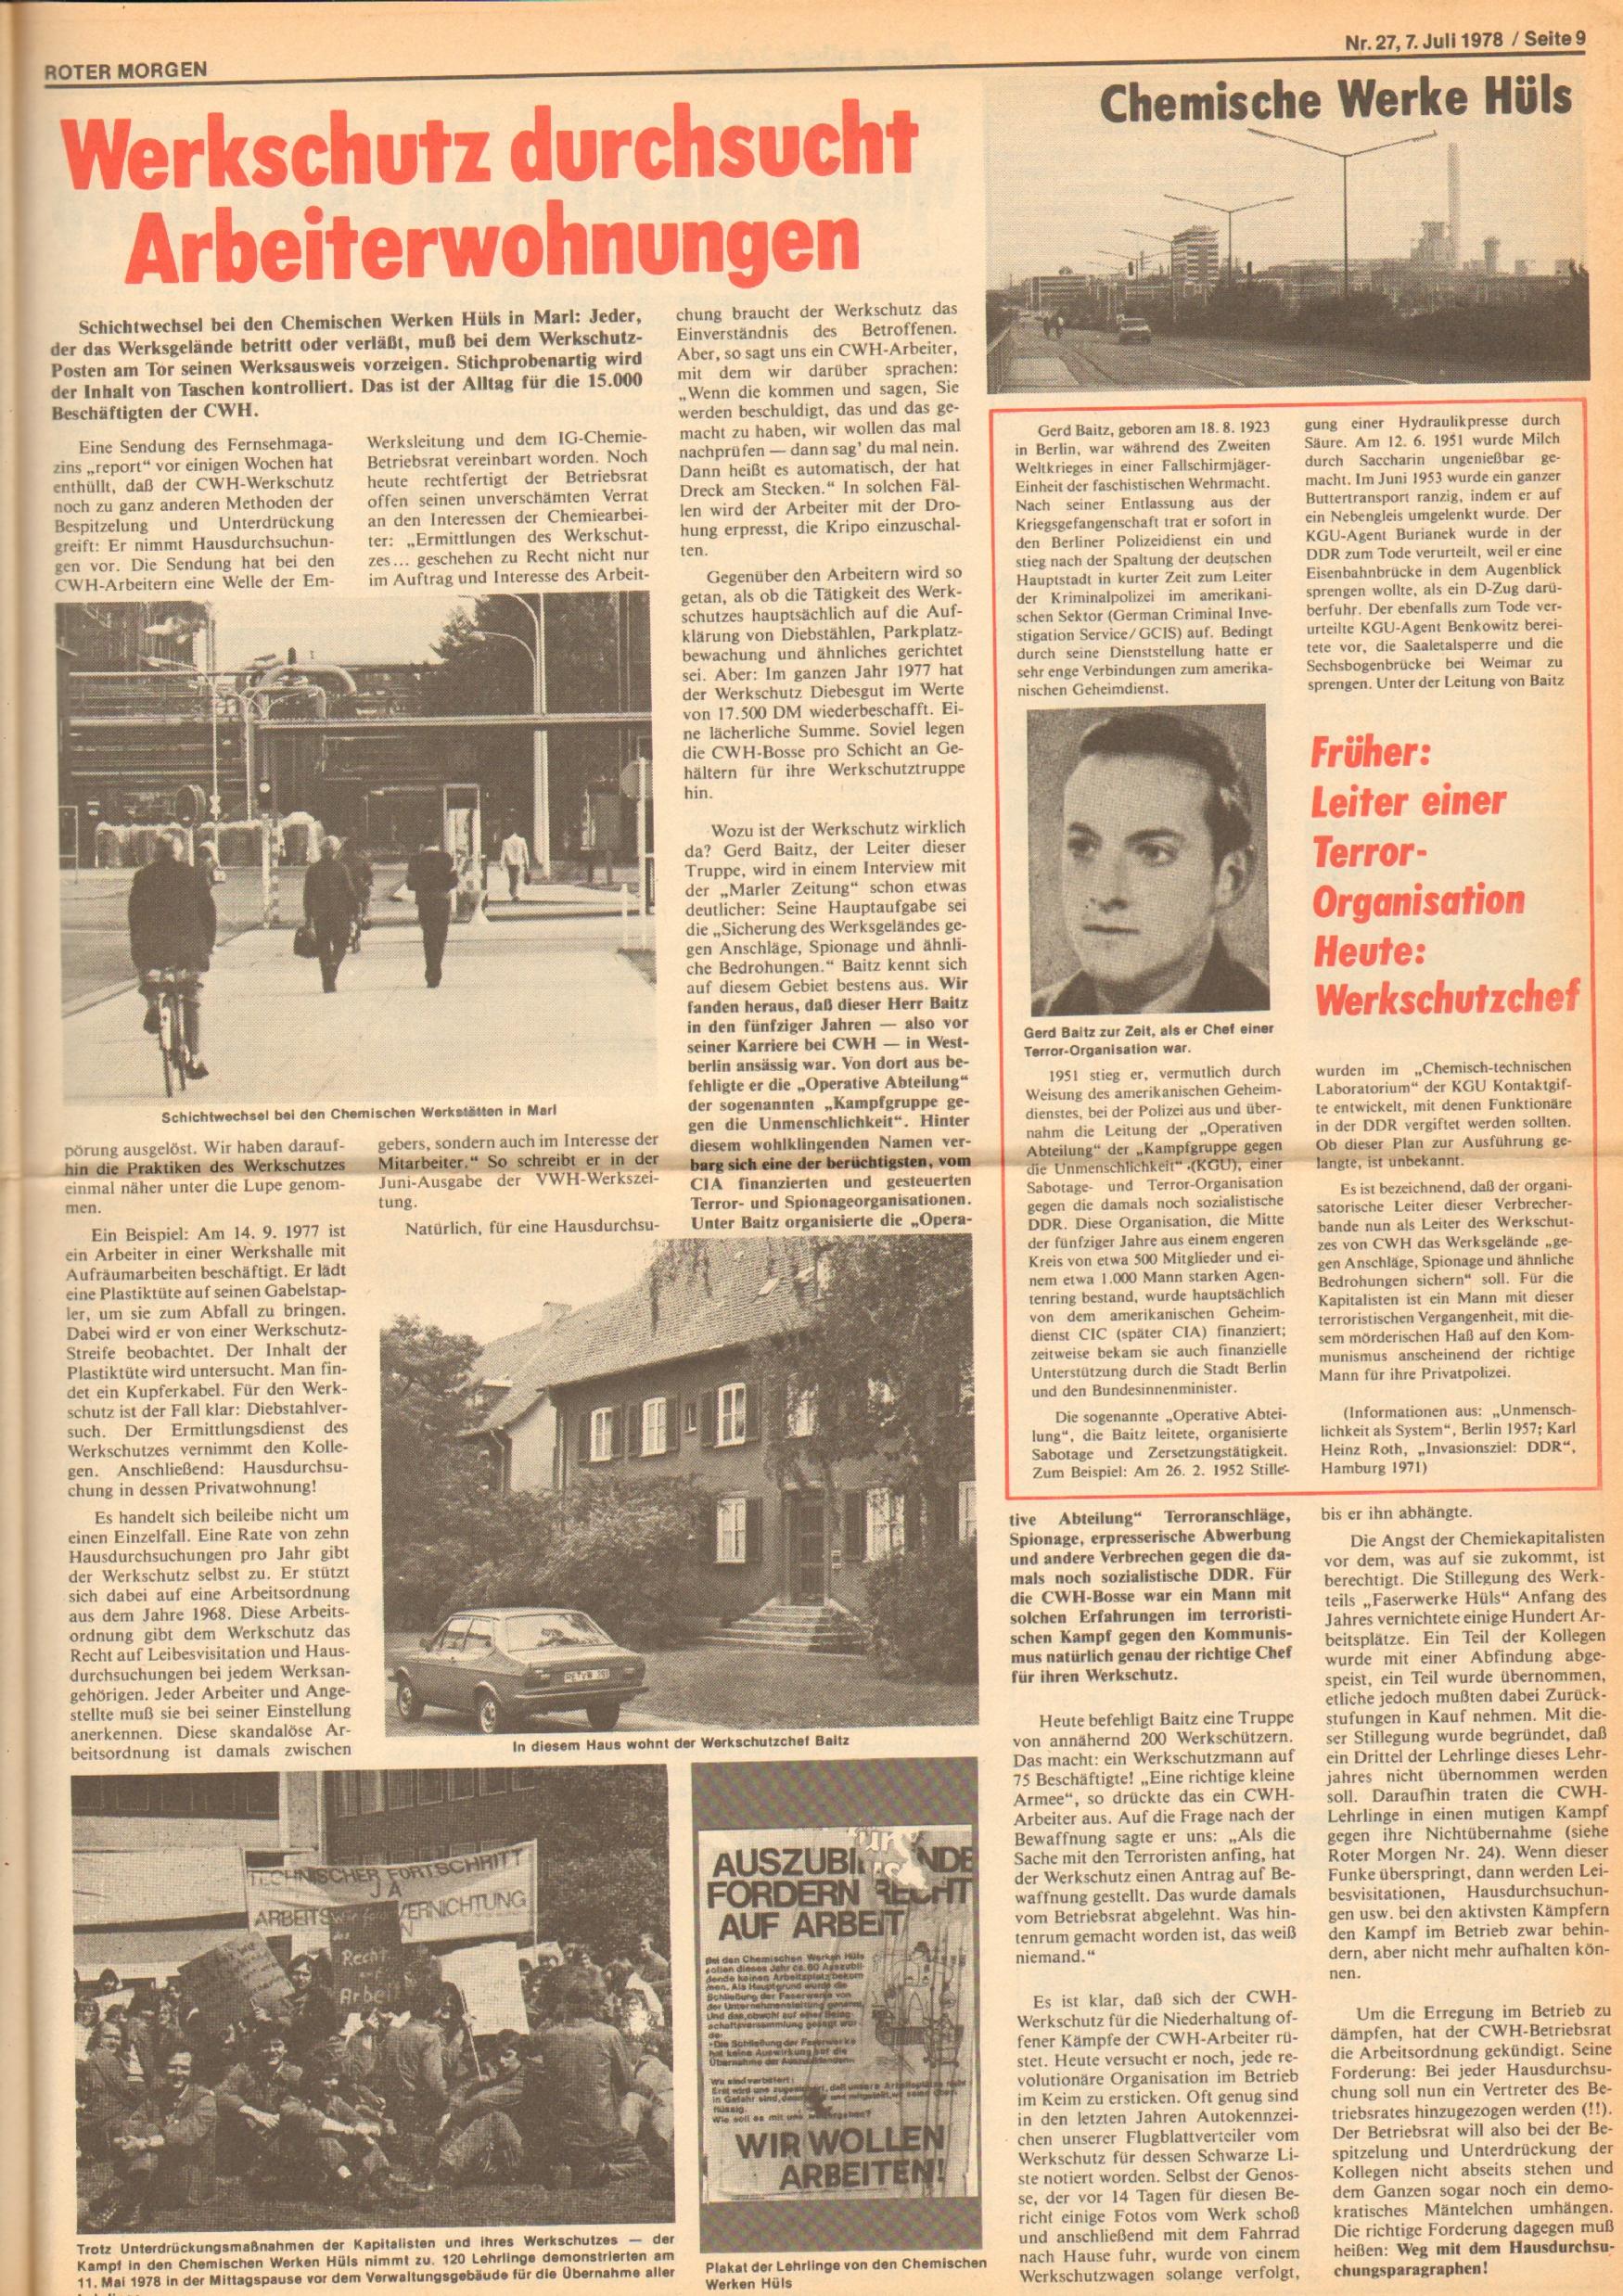 Roter Morgen, 12. Jg., 7. Juli 1978, Nr. 27, Seite 9